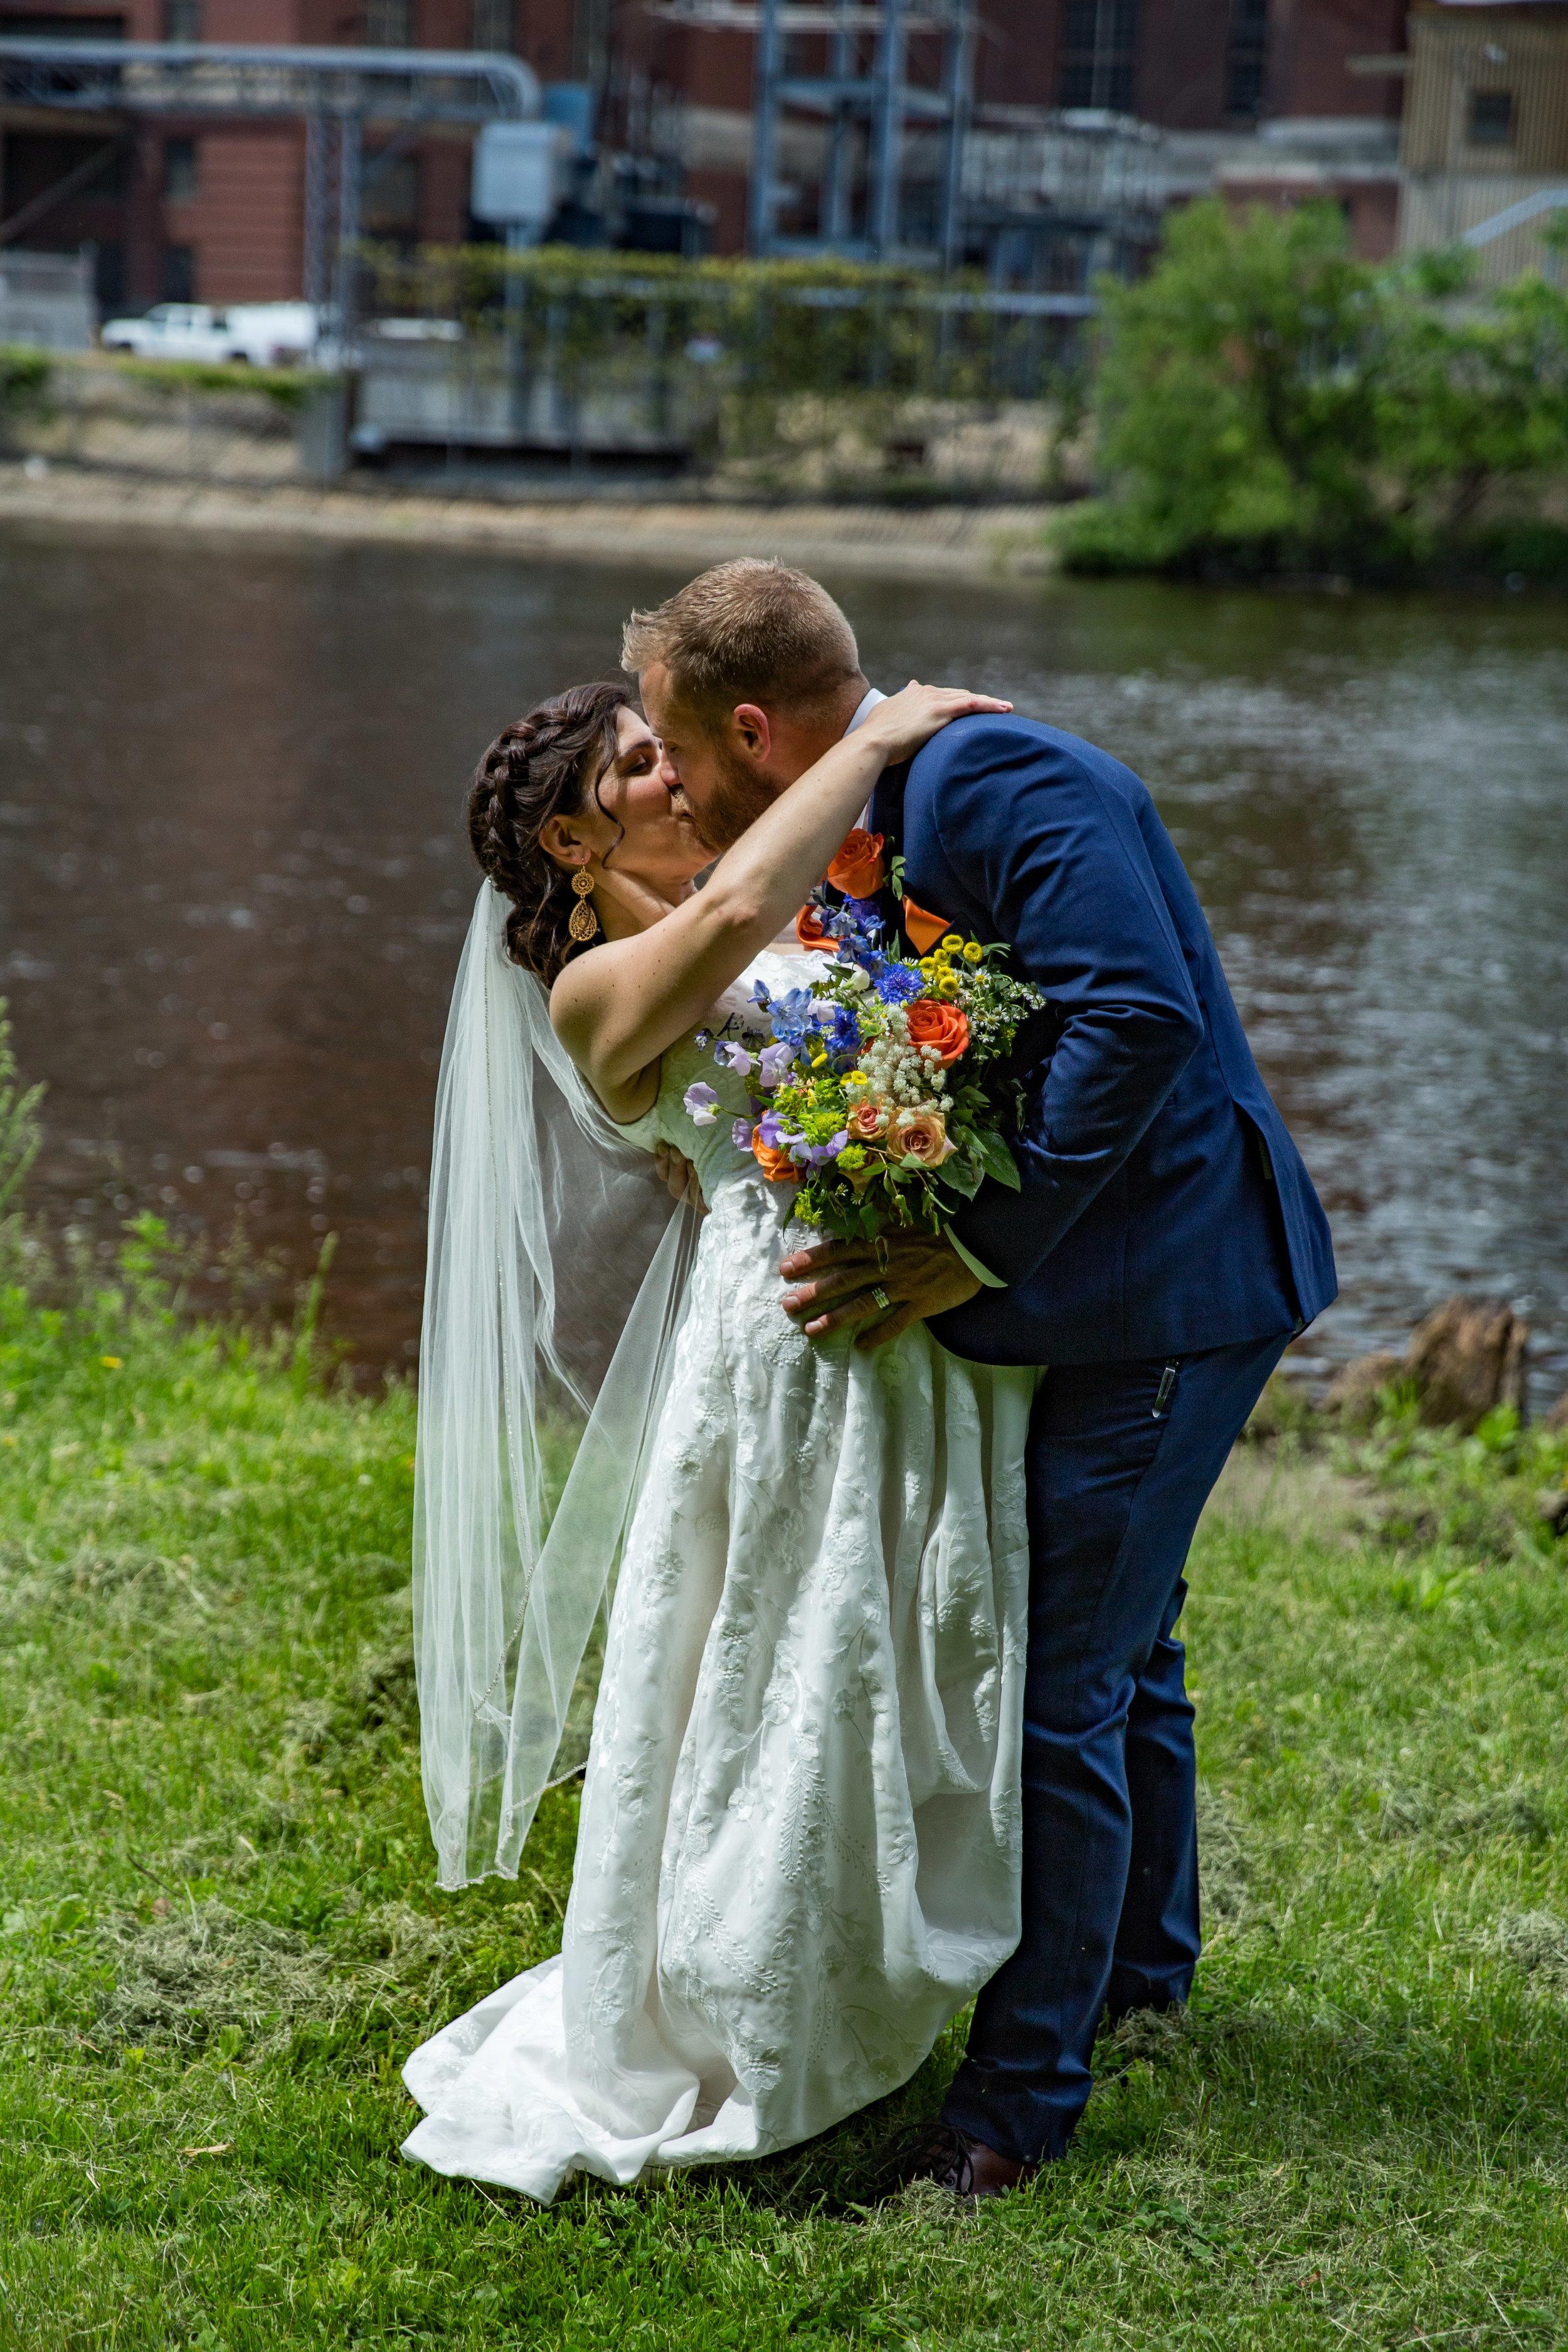 Natalie and Dallas Mooney Wedding 6-8-19_Tania Watt Photography-268.jpg